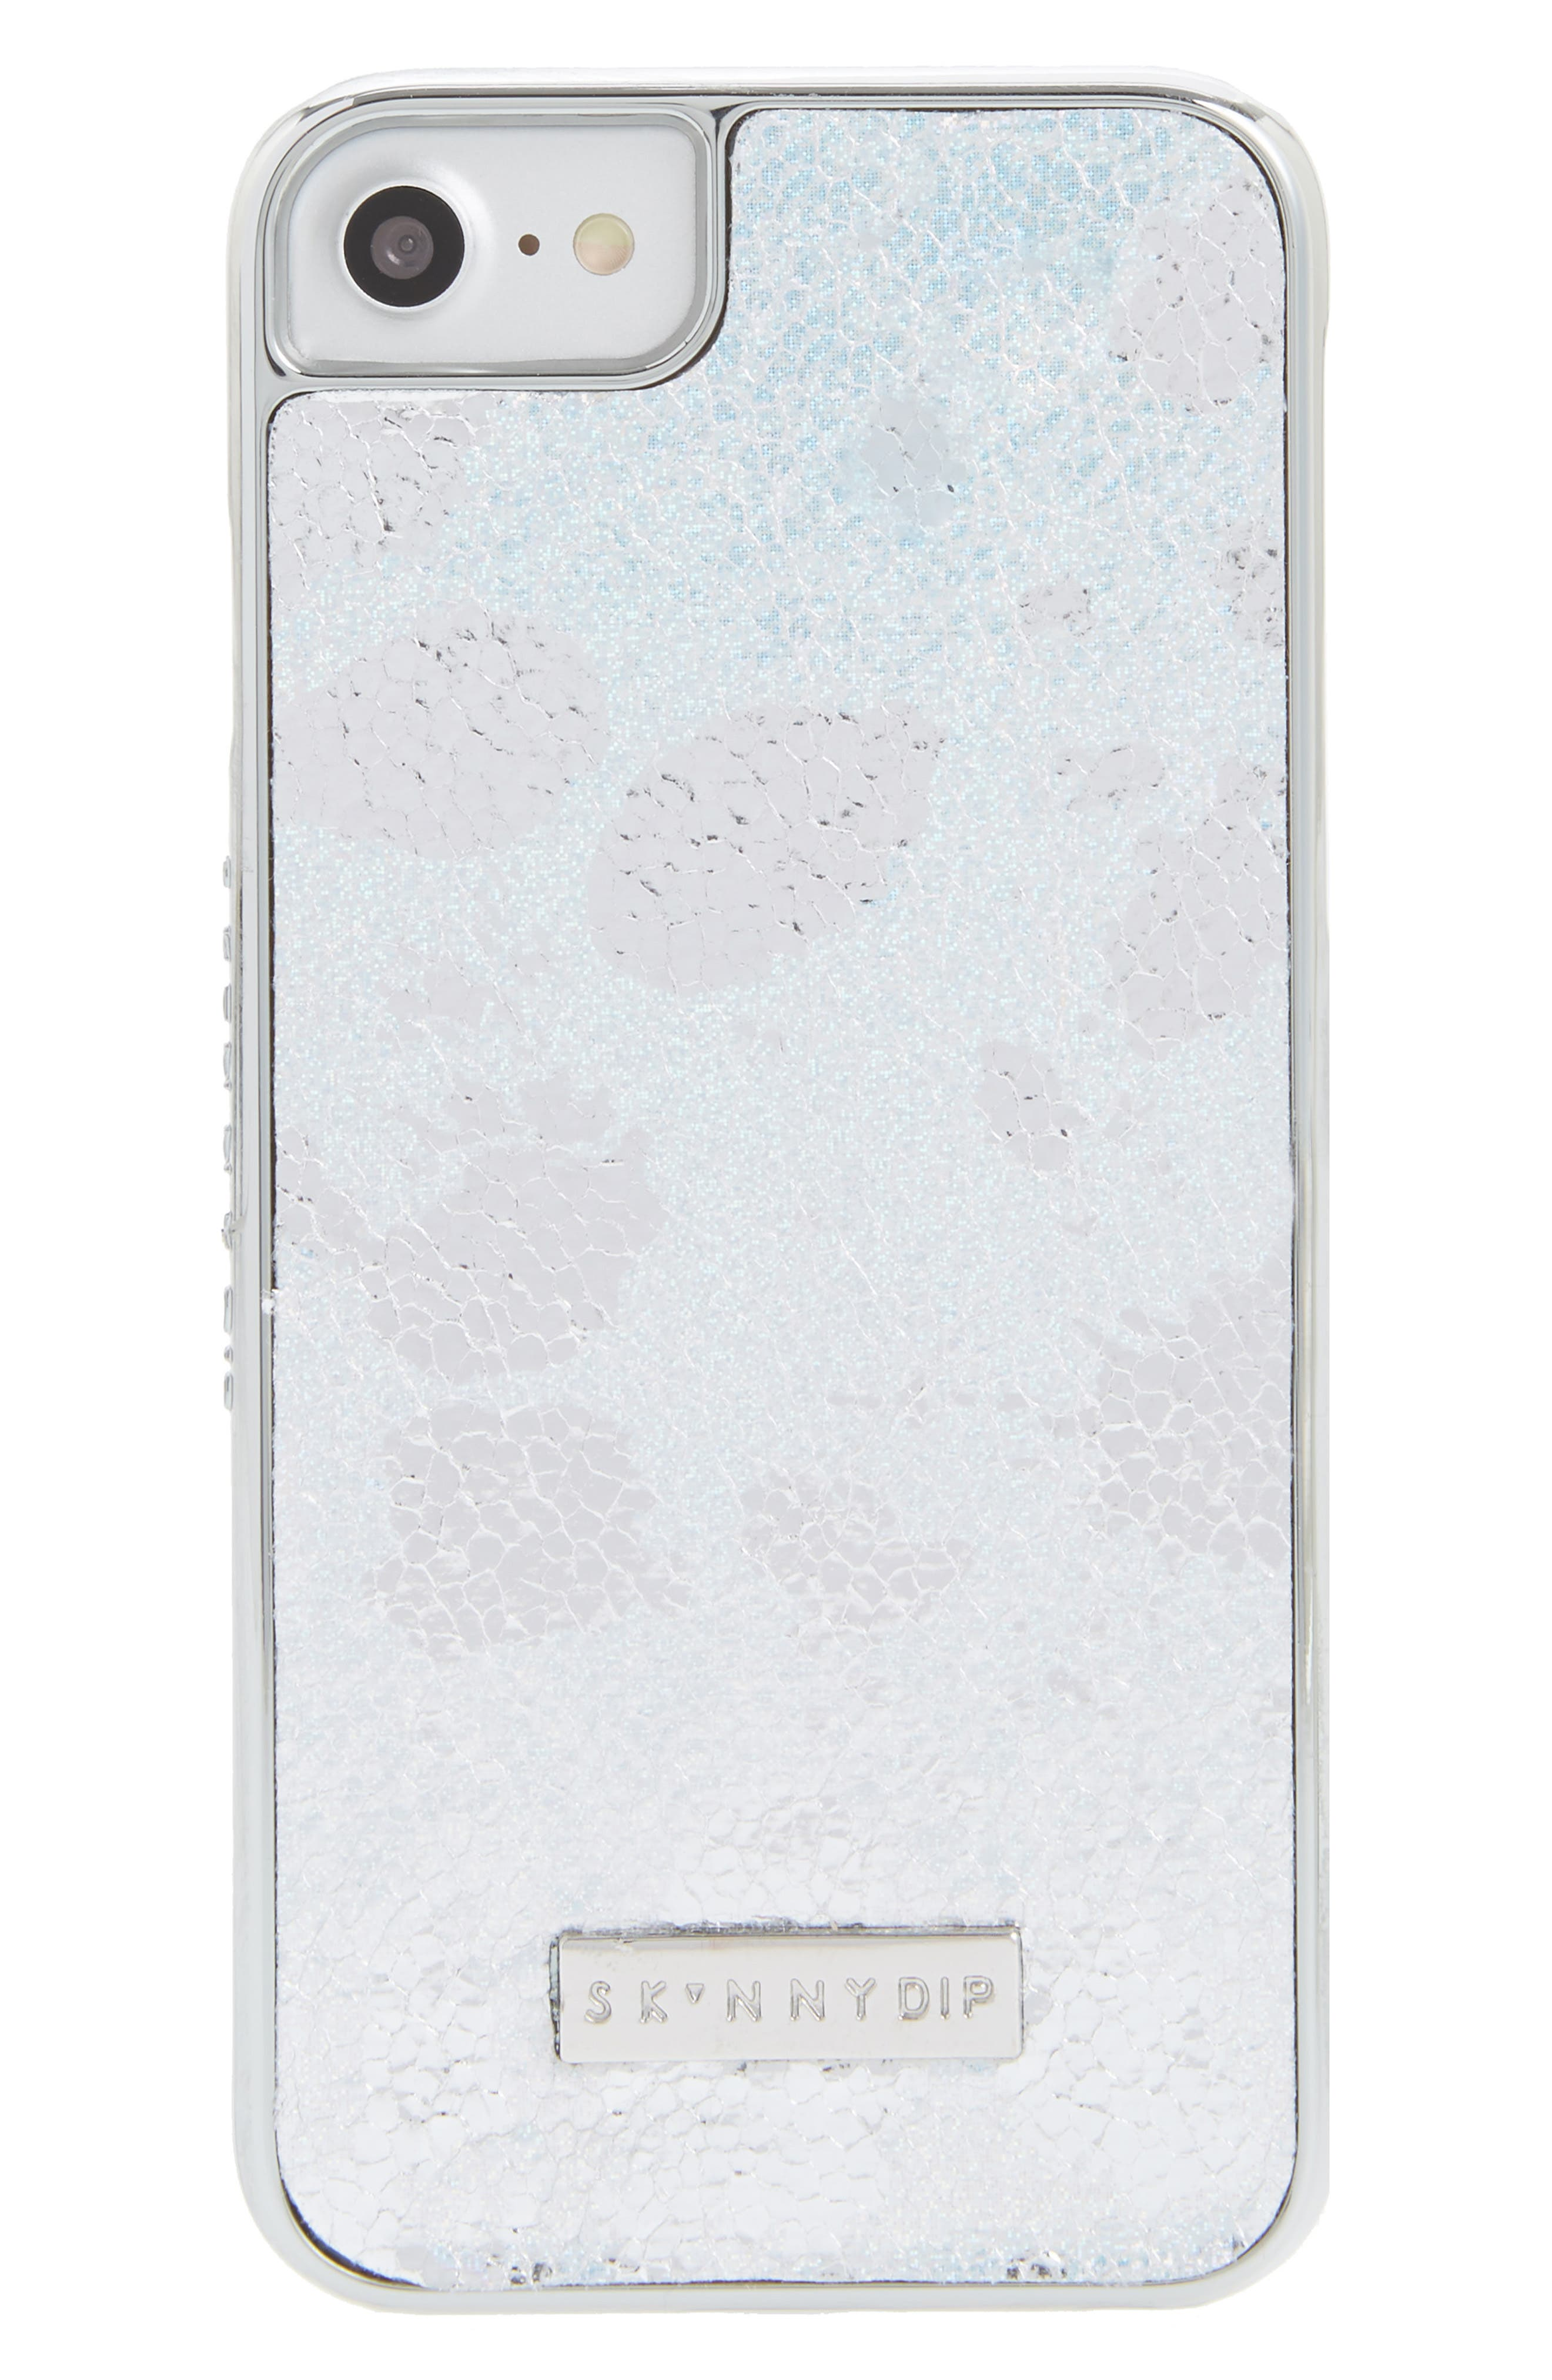 Skinnydip Arizona iPhone 6/7 & 6/7 Plus Case